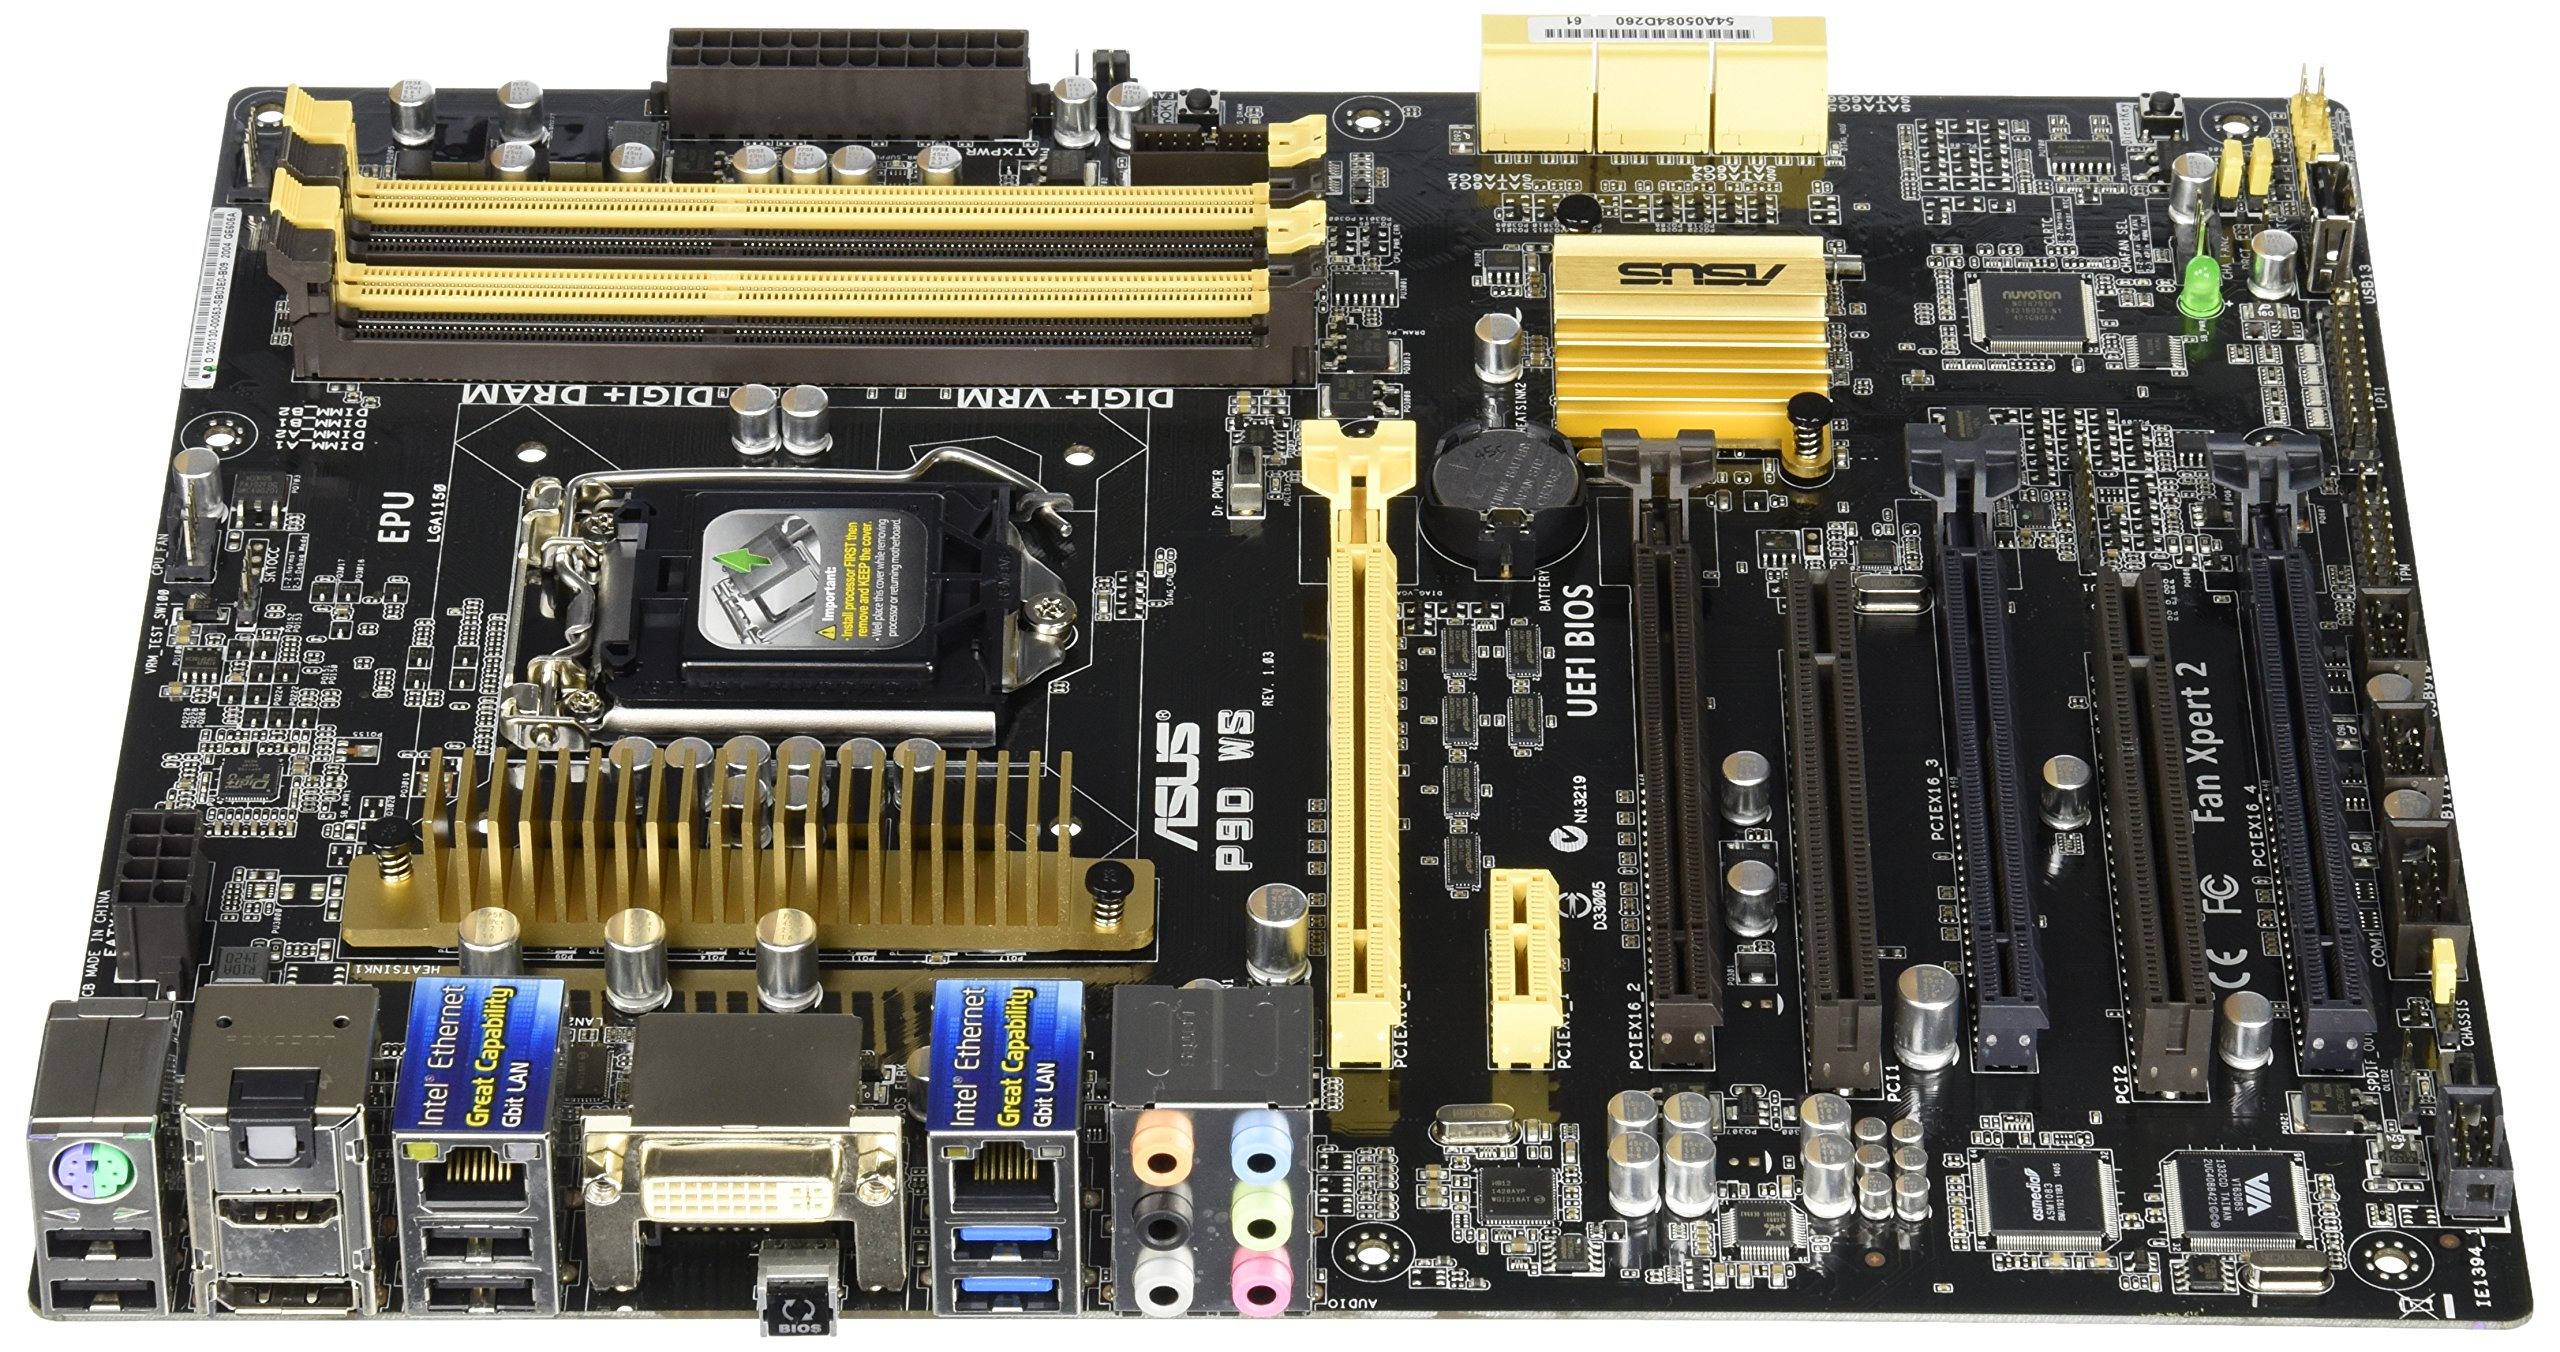 ASUS P9D WS Intel LGA1150 Dual server-grade Intel LAN ATX Server Workstation Motherboard, entry-level Workstation Software certified